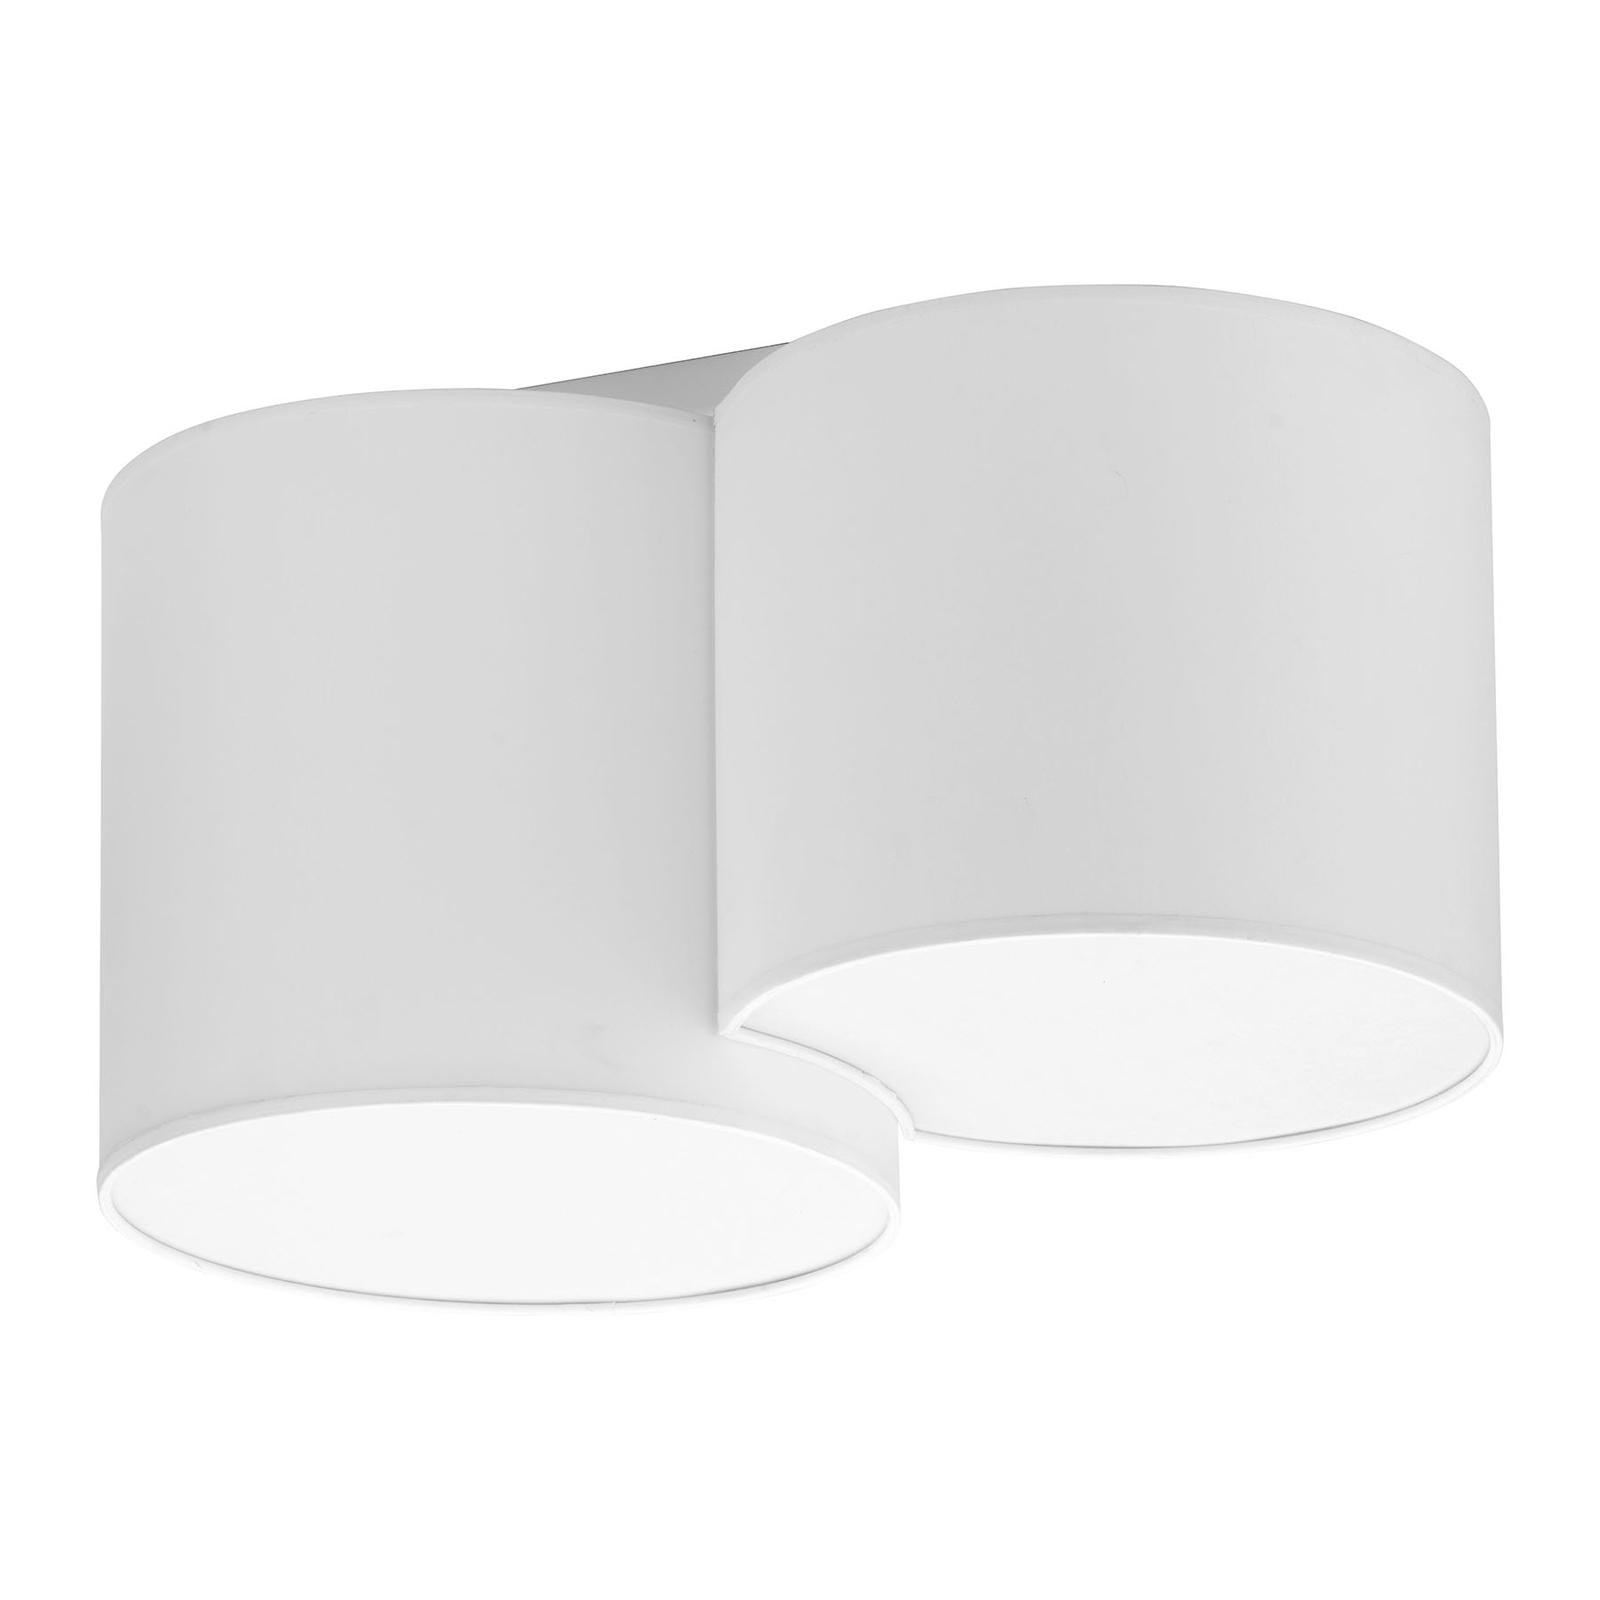 Taklampe Mona, 2 lyskilder, hvit